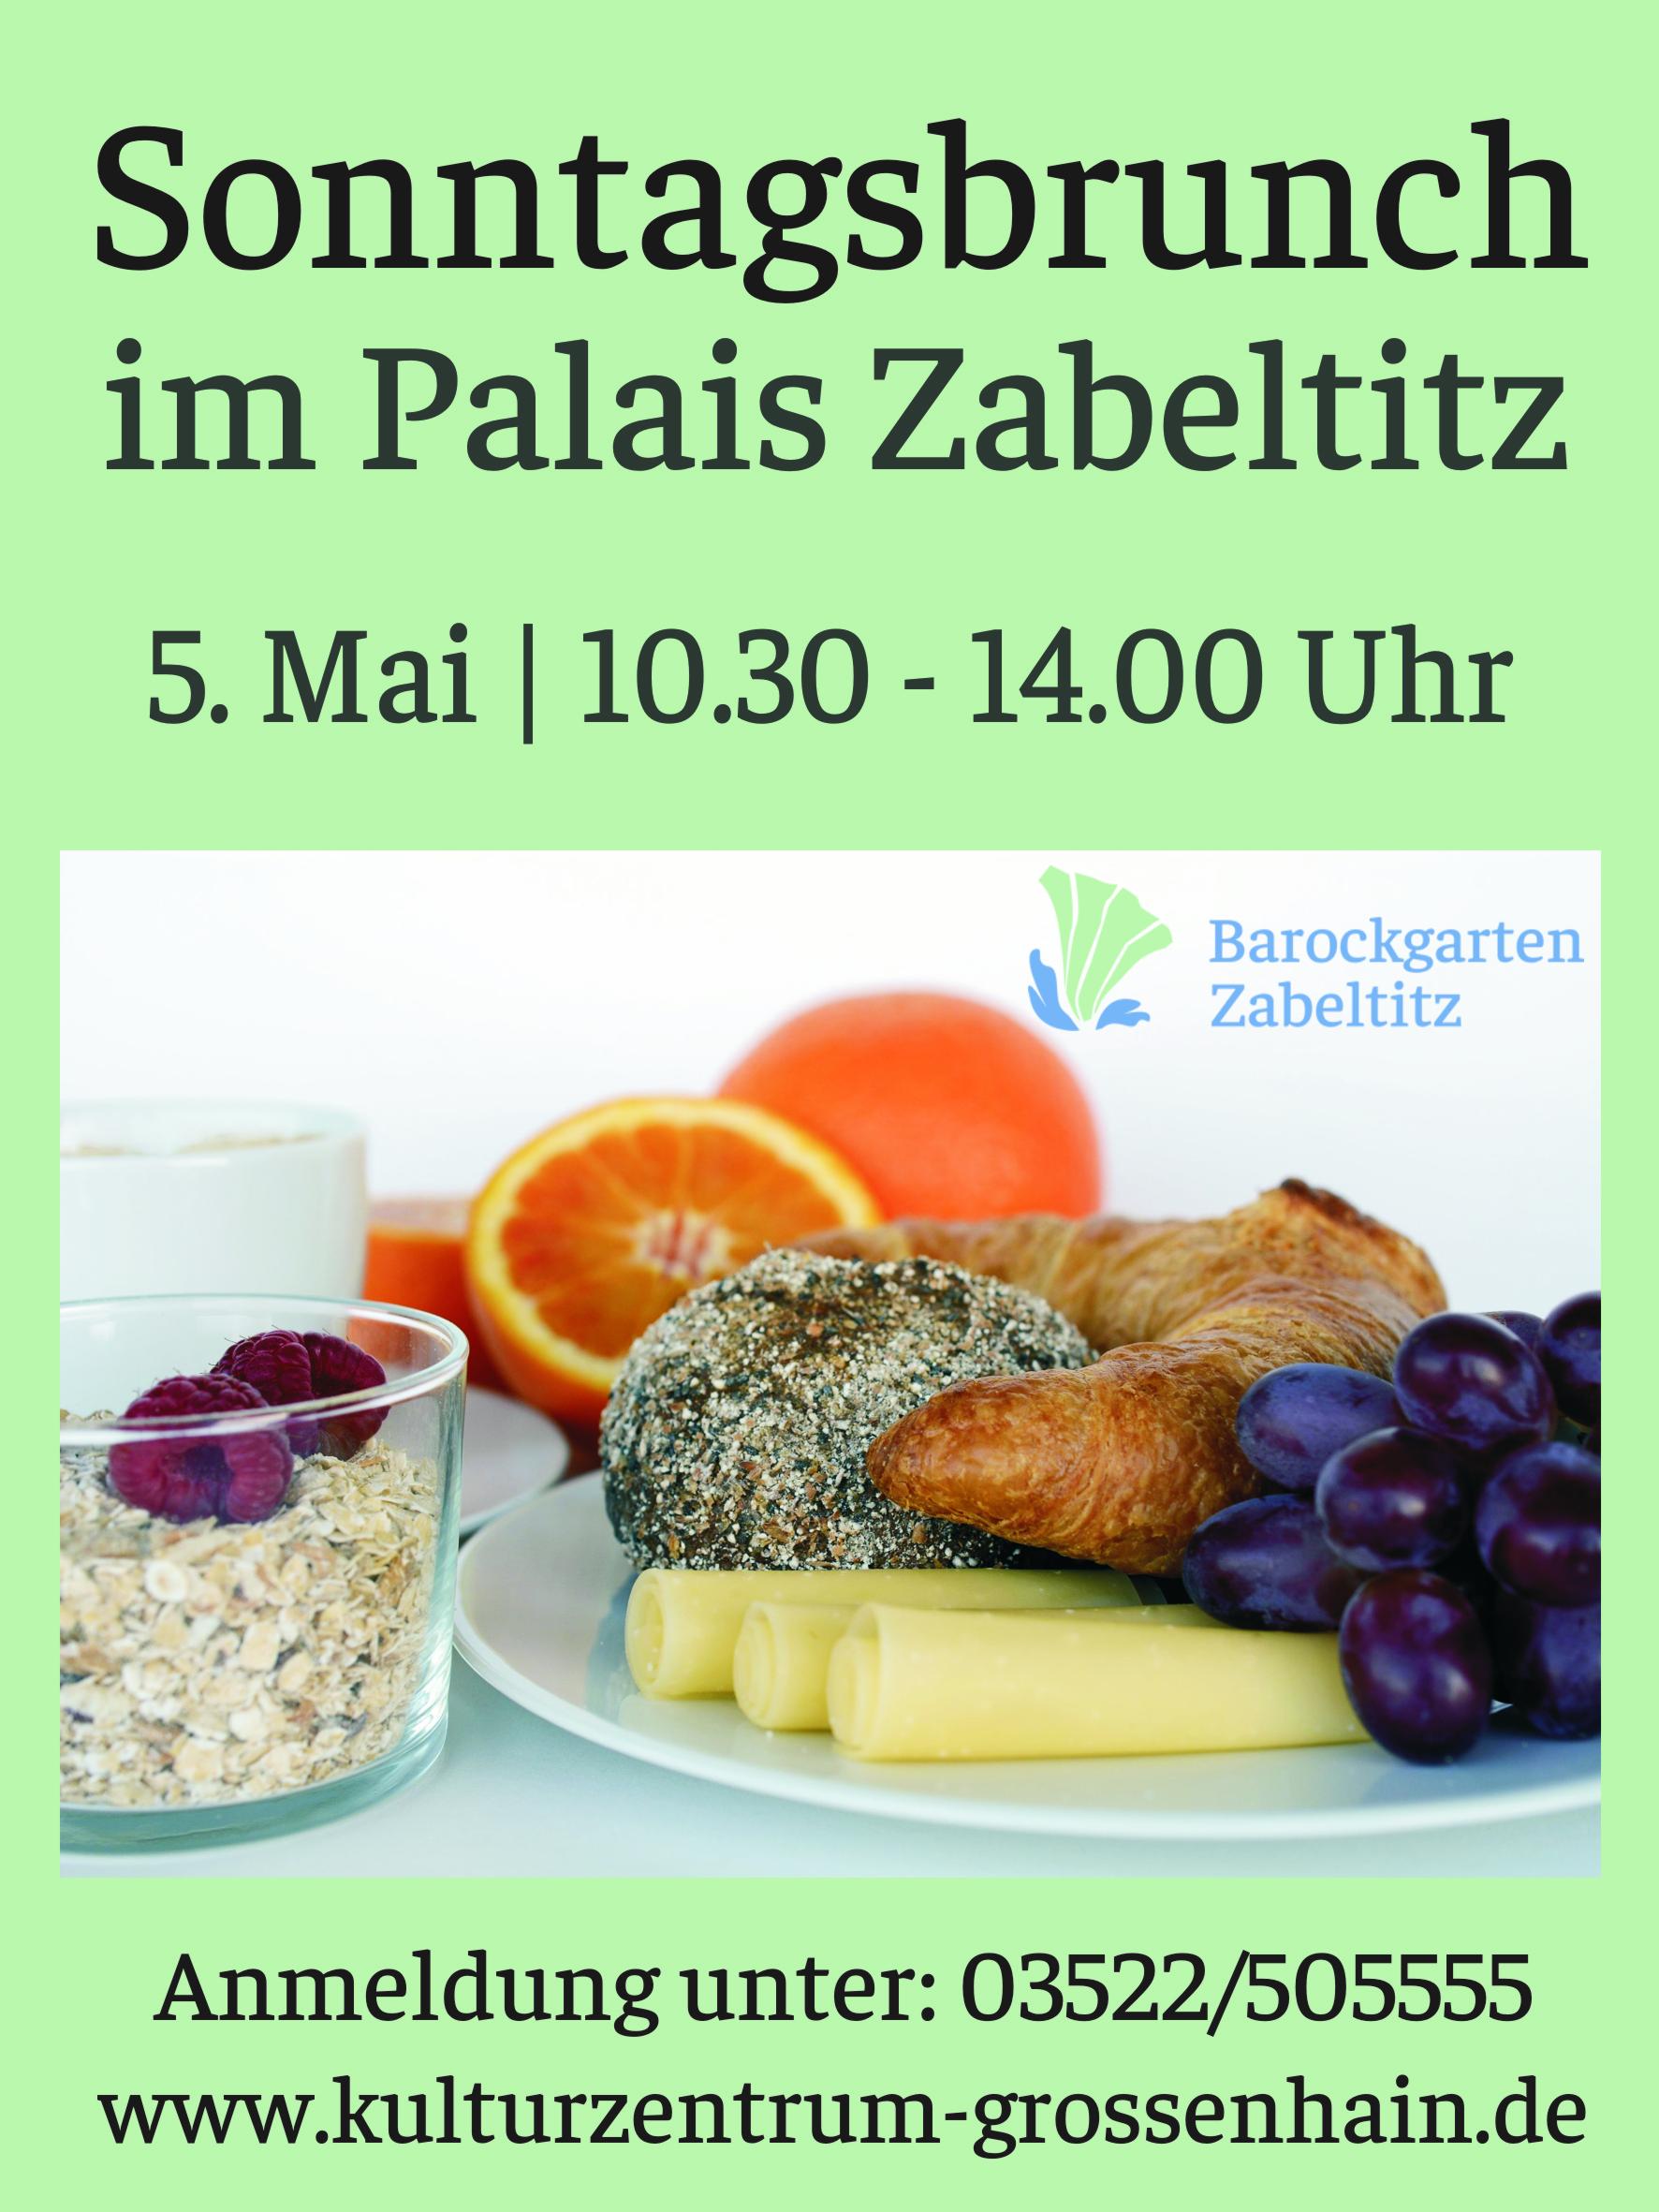 Sonntagsbrunch im Palais Zabeltitz